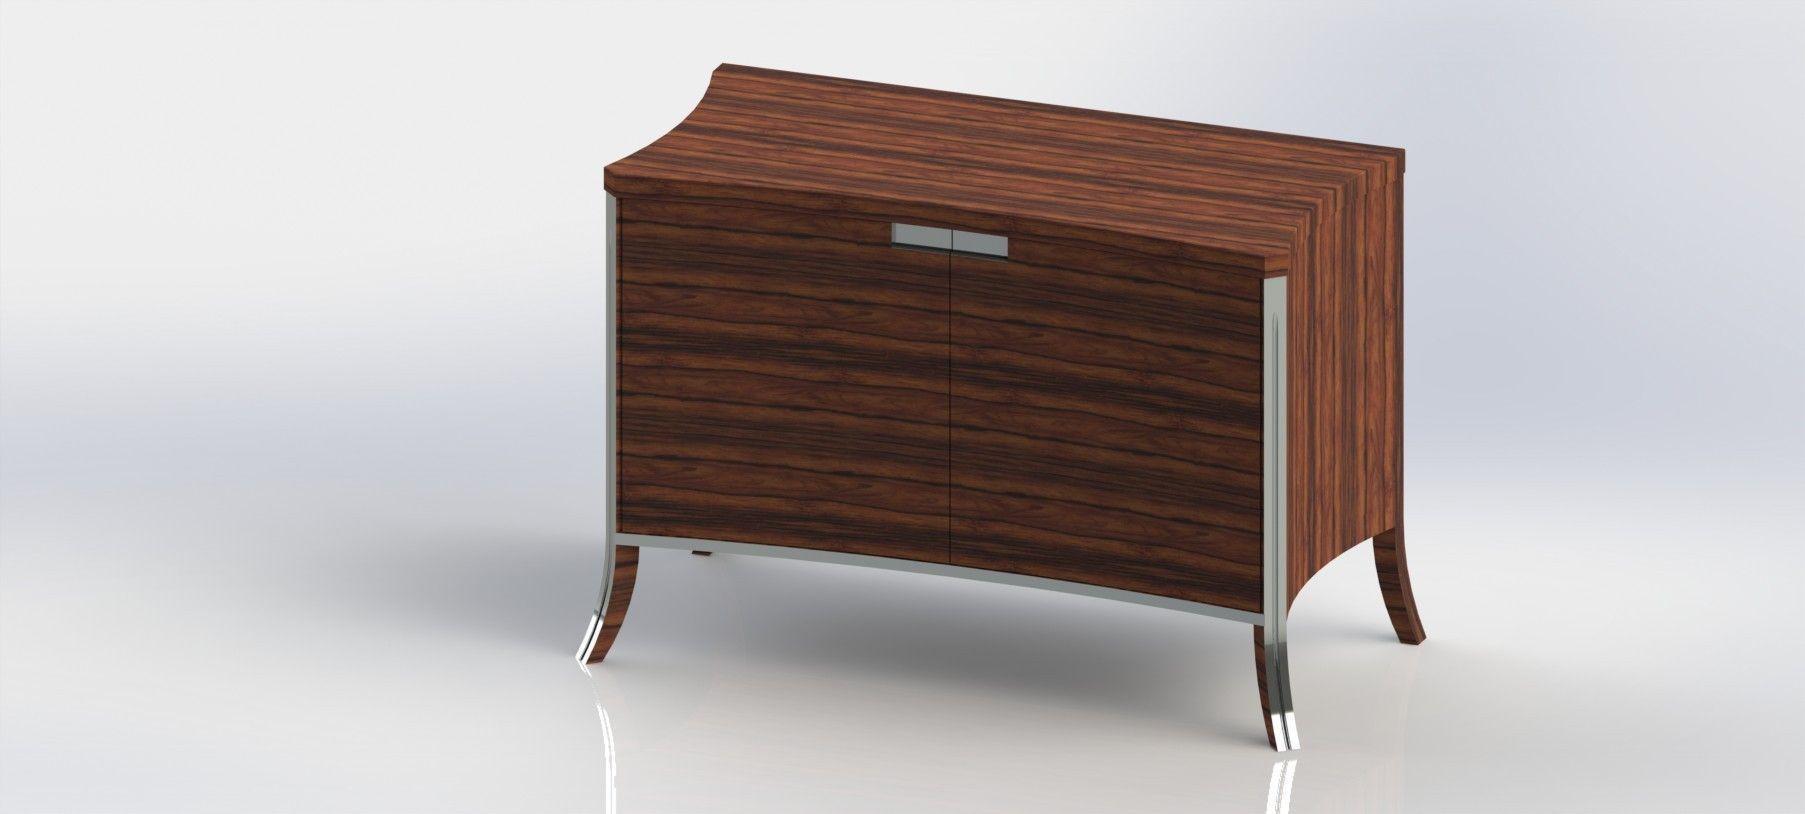 Sideboard 3d model stl dwg sldprt sldasm slddrw ige for Sideboard 3d